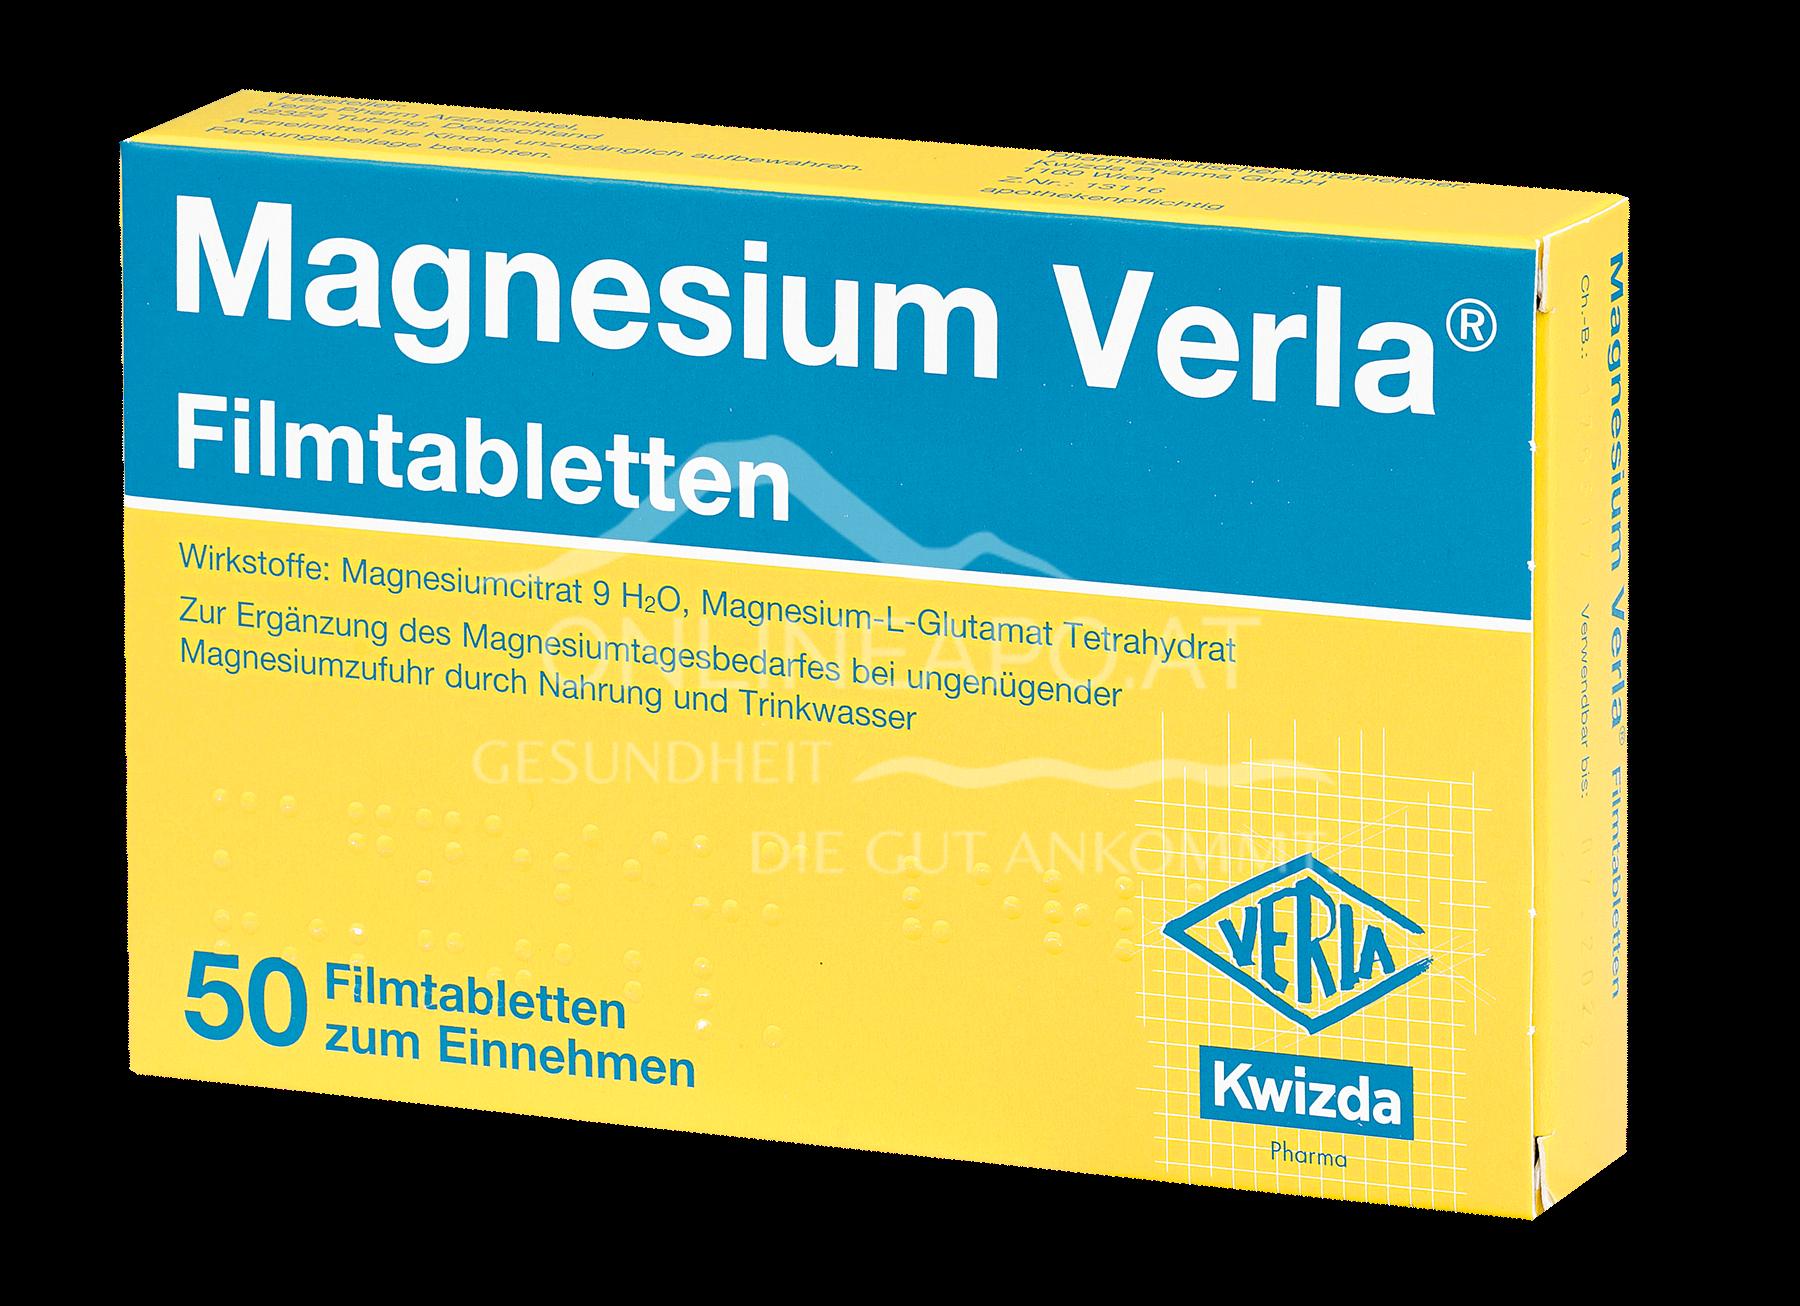 MAGNESIUM VERLA® Filmtabletten